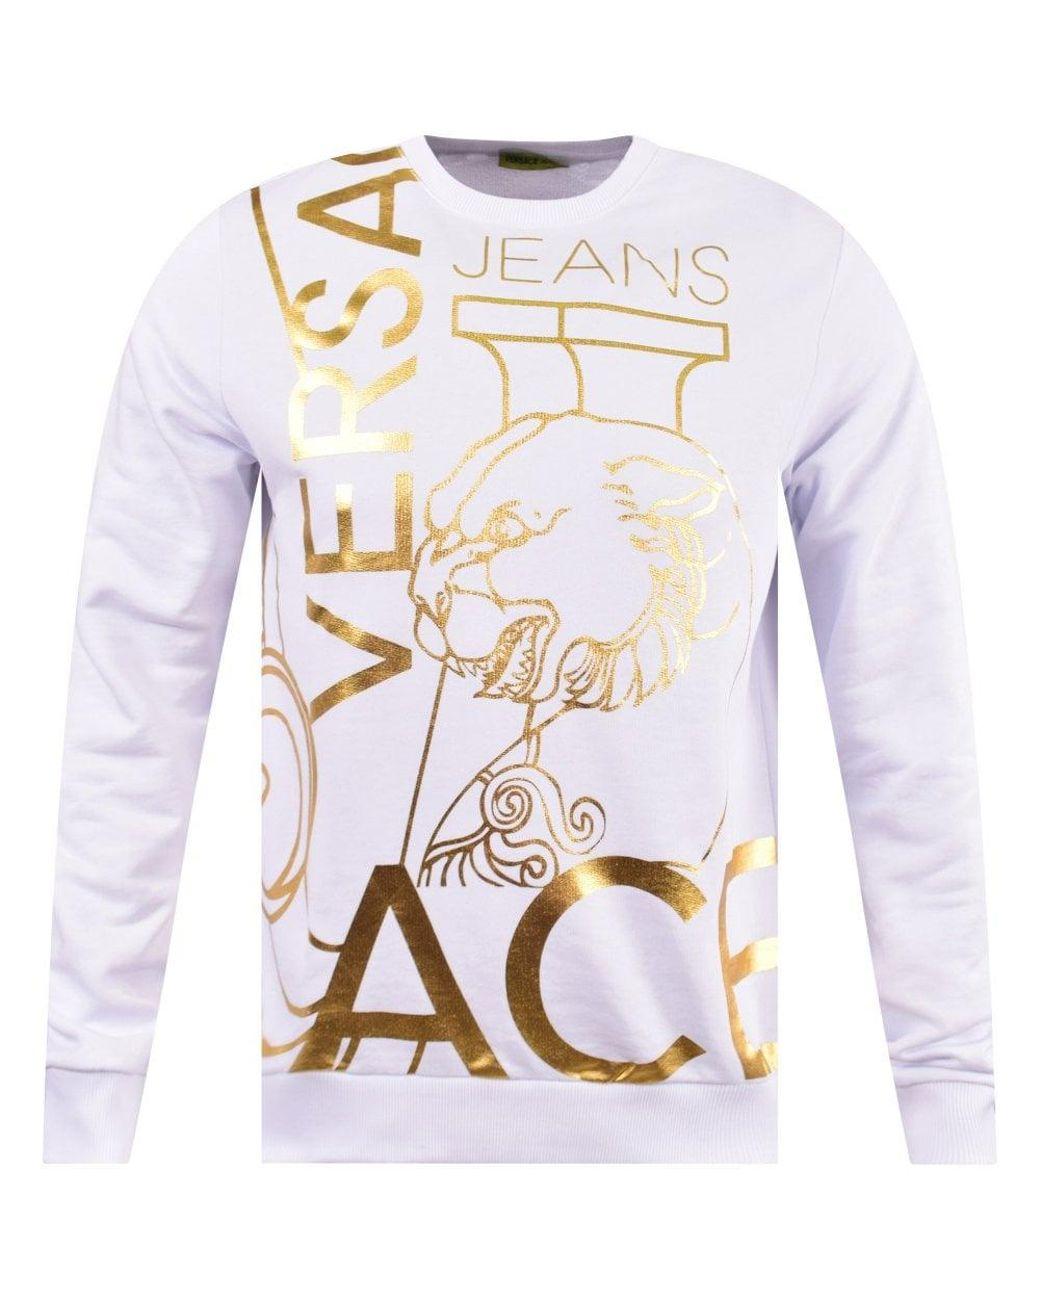 c367bb35 Versace Jeans Gold Foil T Shirt White - raveitsafe